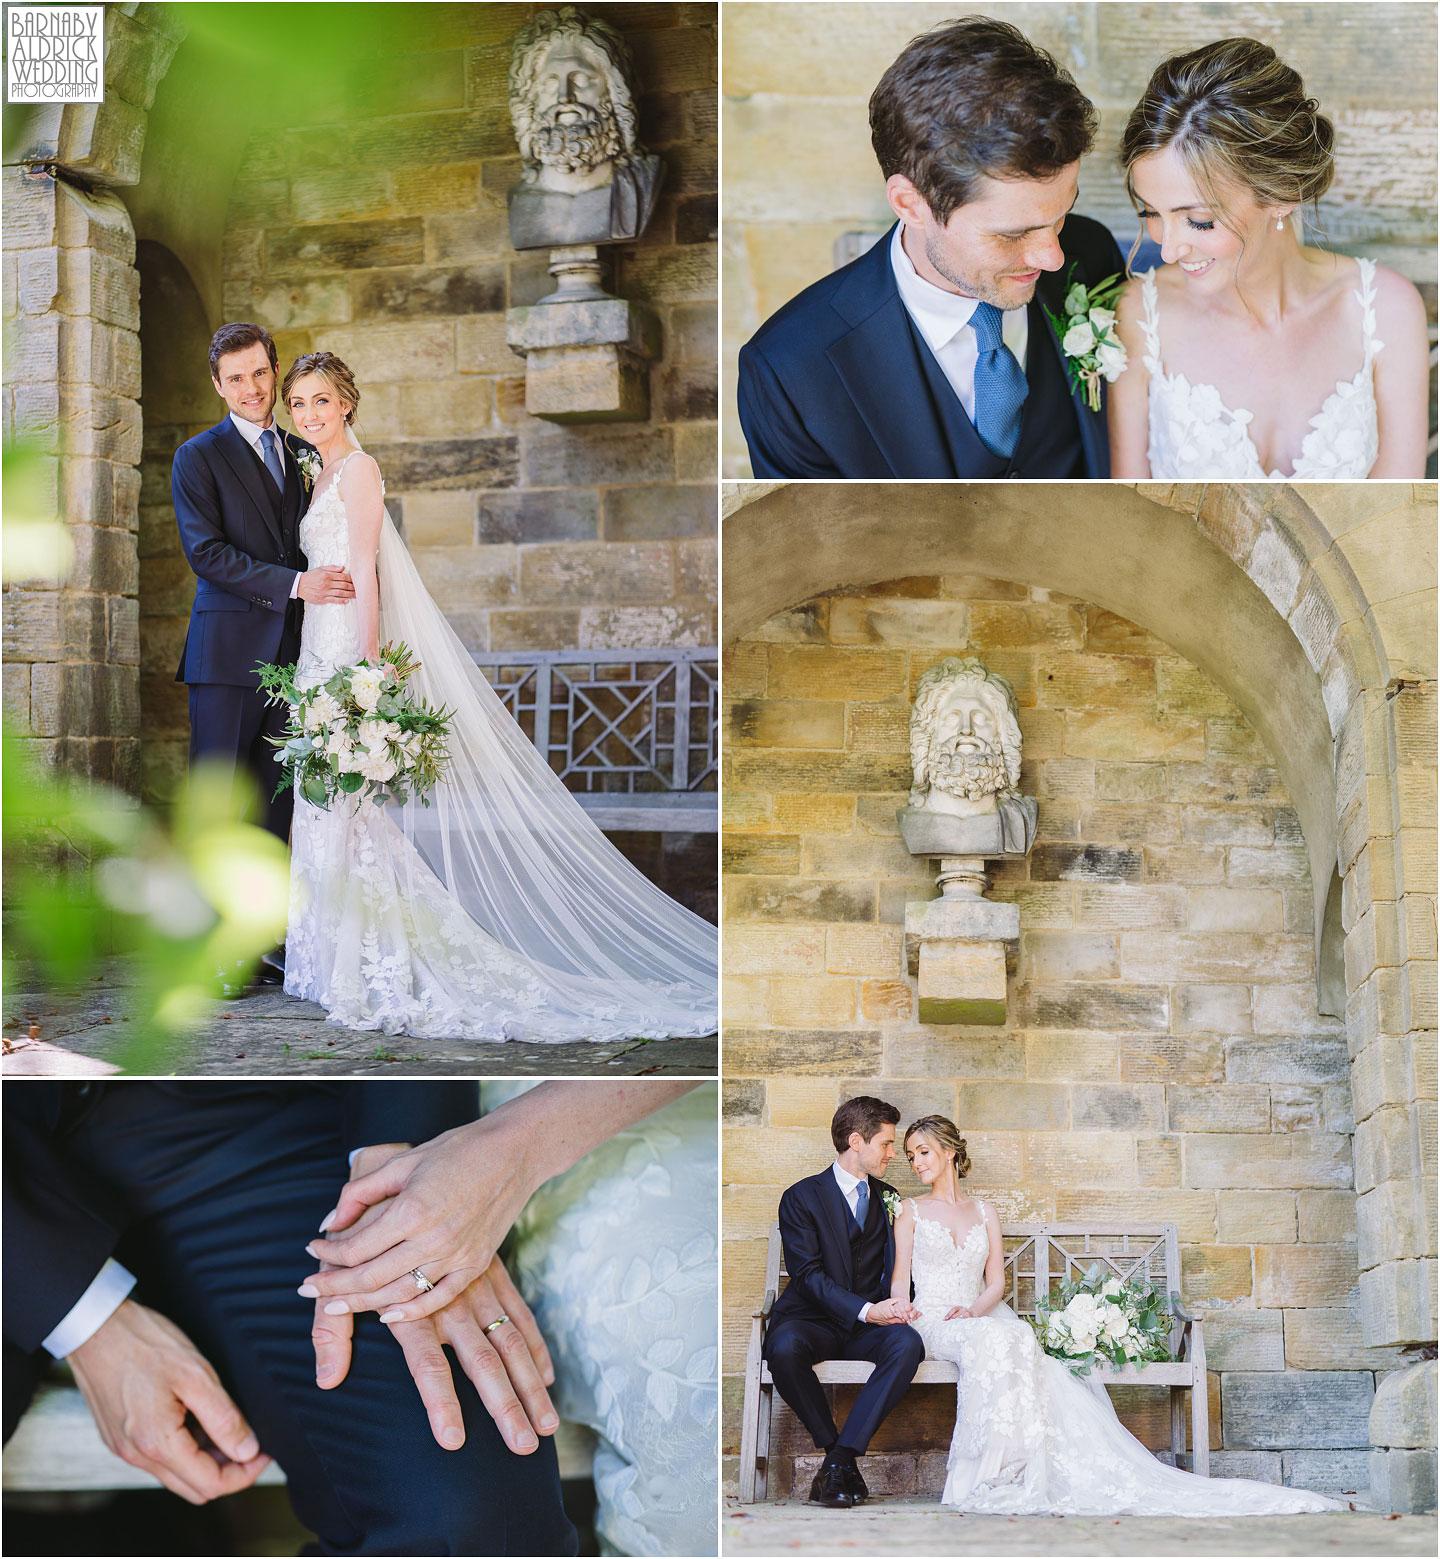 Rudding Park Wedding, Yorkshire Photographer Barnaby Aldrick, Rudding Park Harrogate Wedding Photos, Spring Yorkshire Wedding Photos